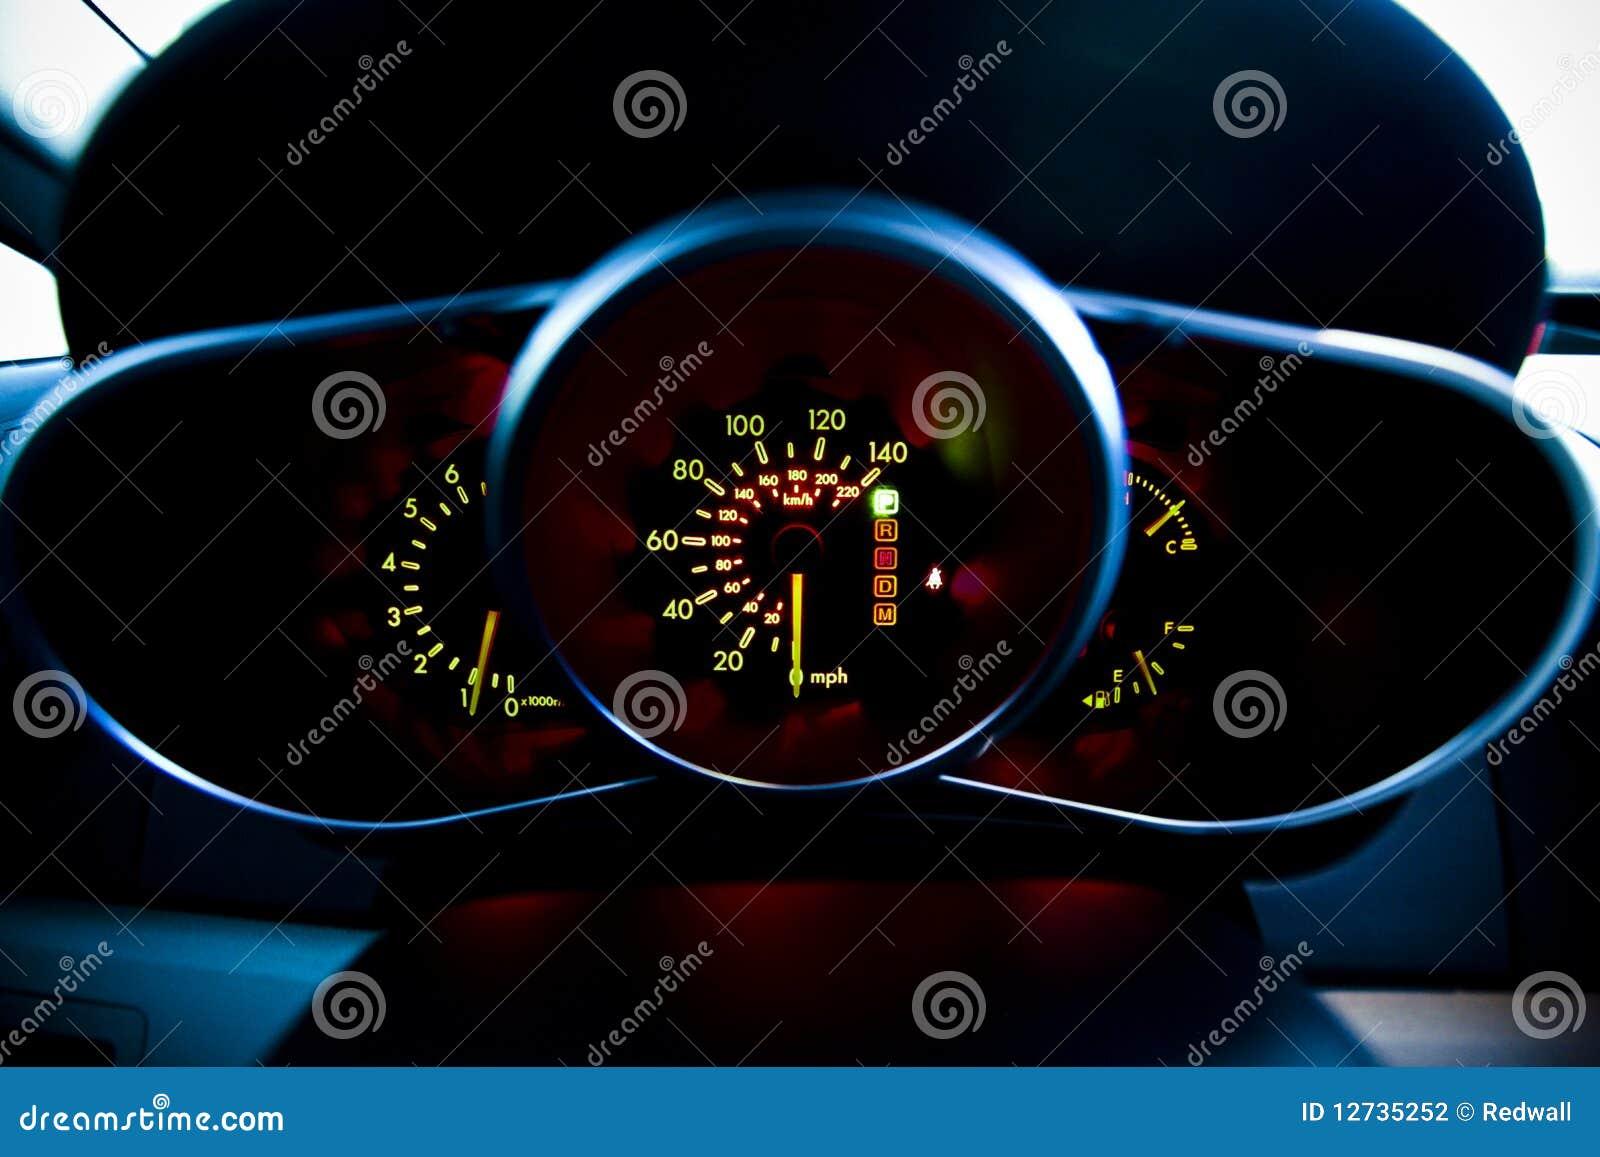 how to fix car speedometer light